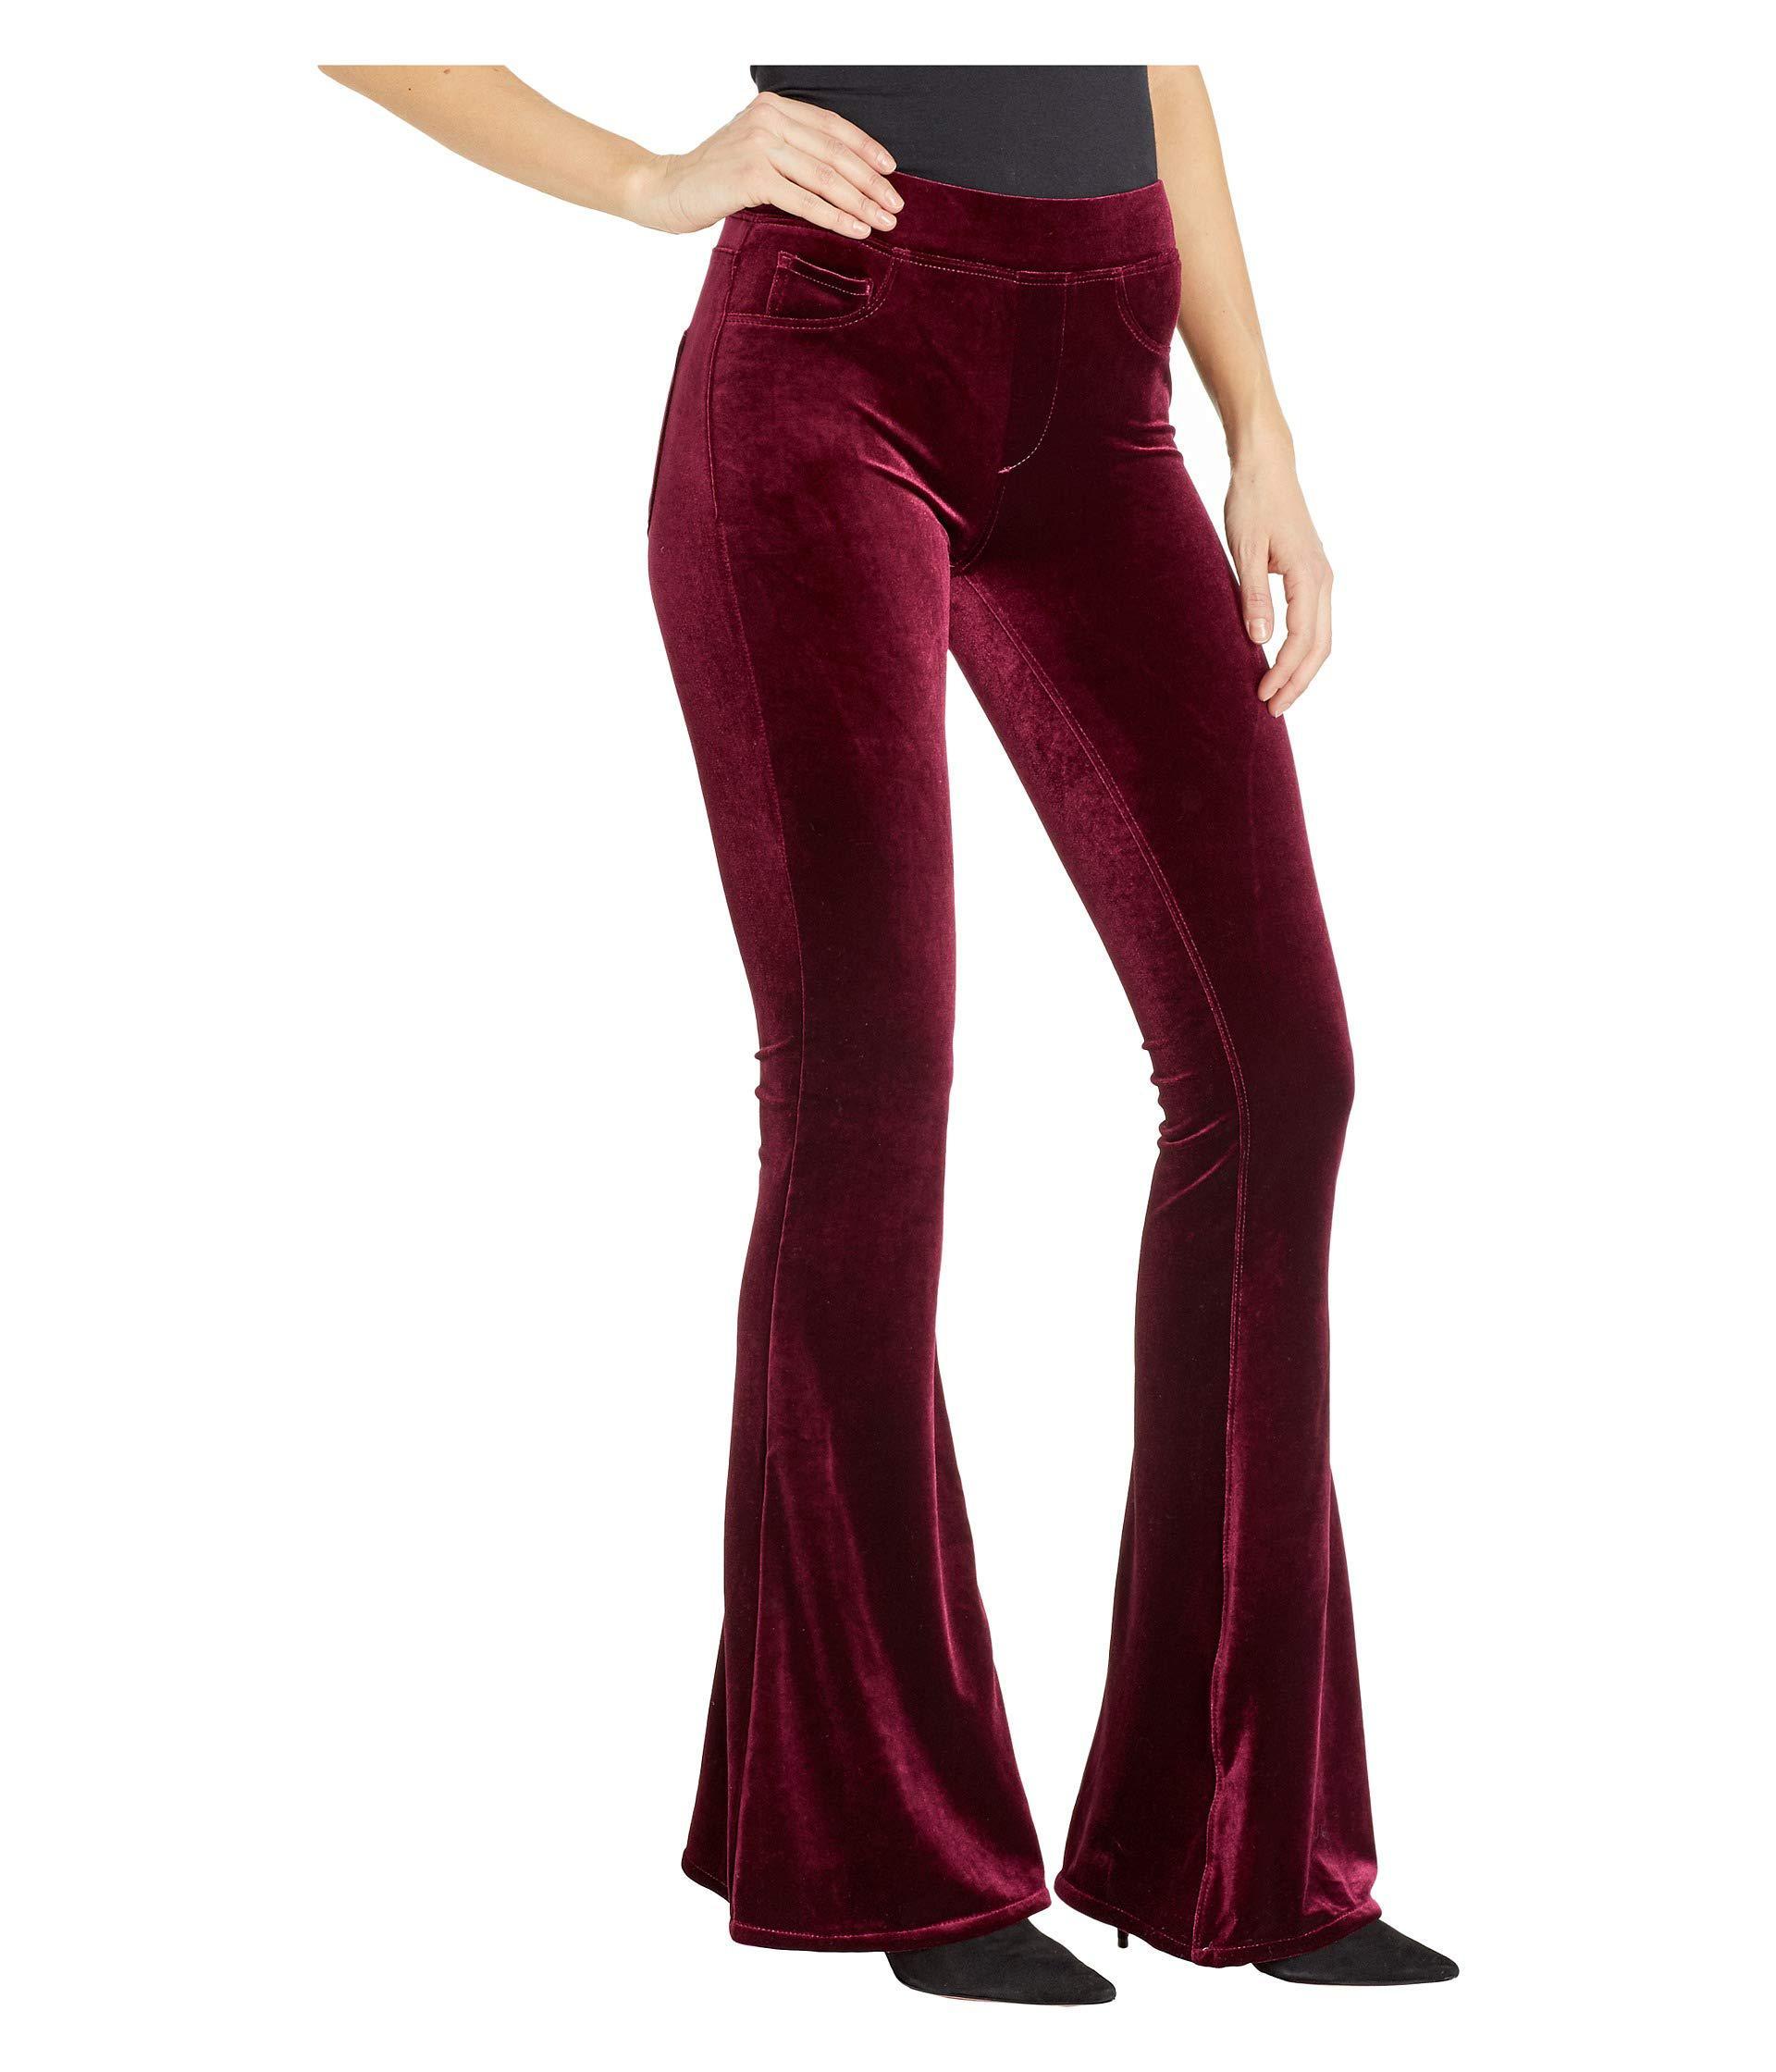 18236667cb3fe Lyst - Blank NYC Pull-on Velvet Flare Pants In Identity Crisis ...